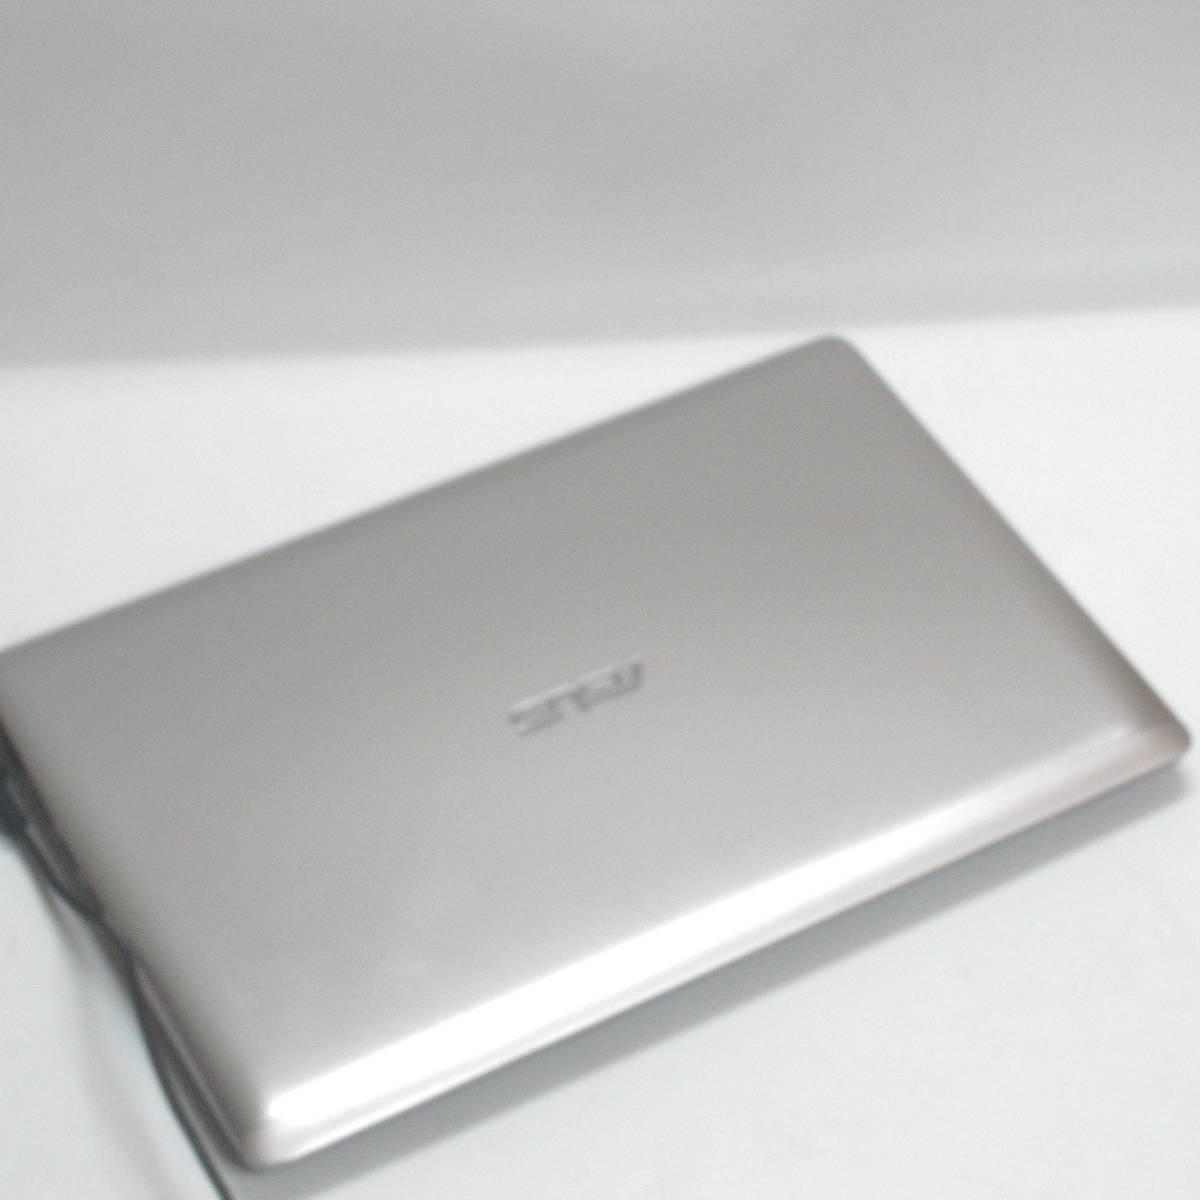 ASUS VivoBook X202E 送料無料 Core i3 1.8GHz 11インチタッチパネル液晶 メモリ4GB HDD500GB WIN10 #2_画像4